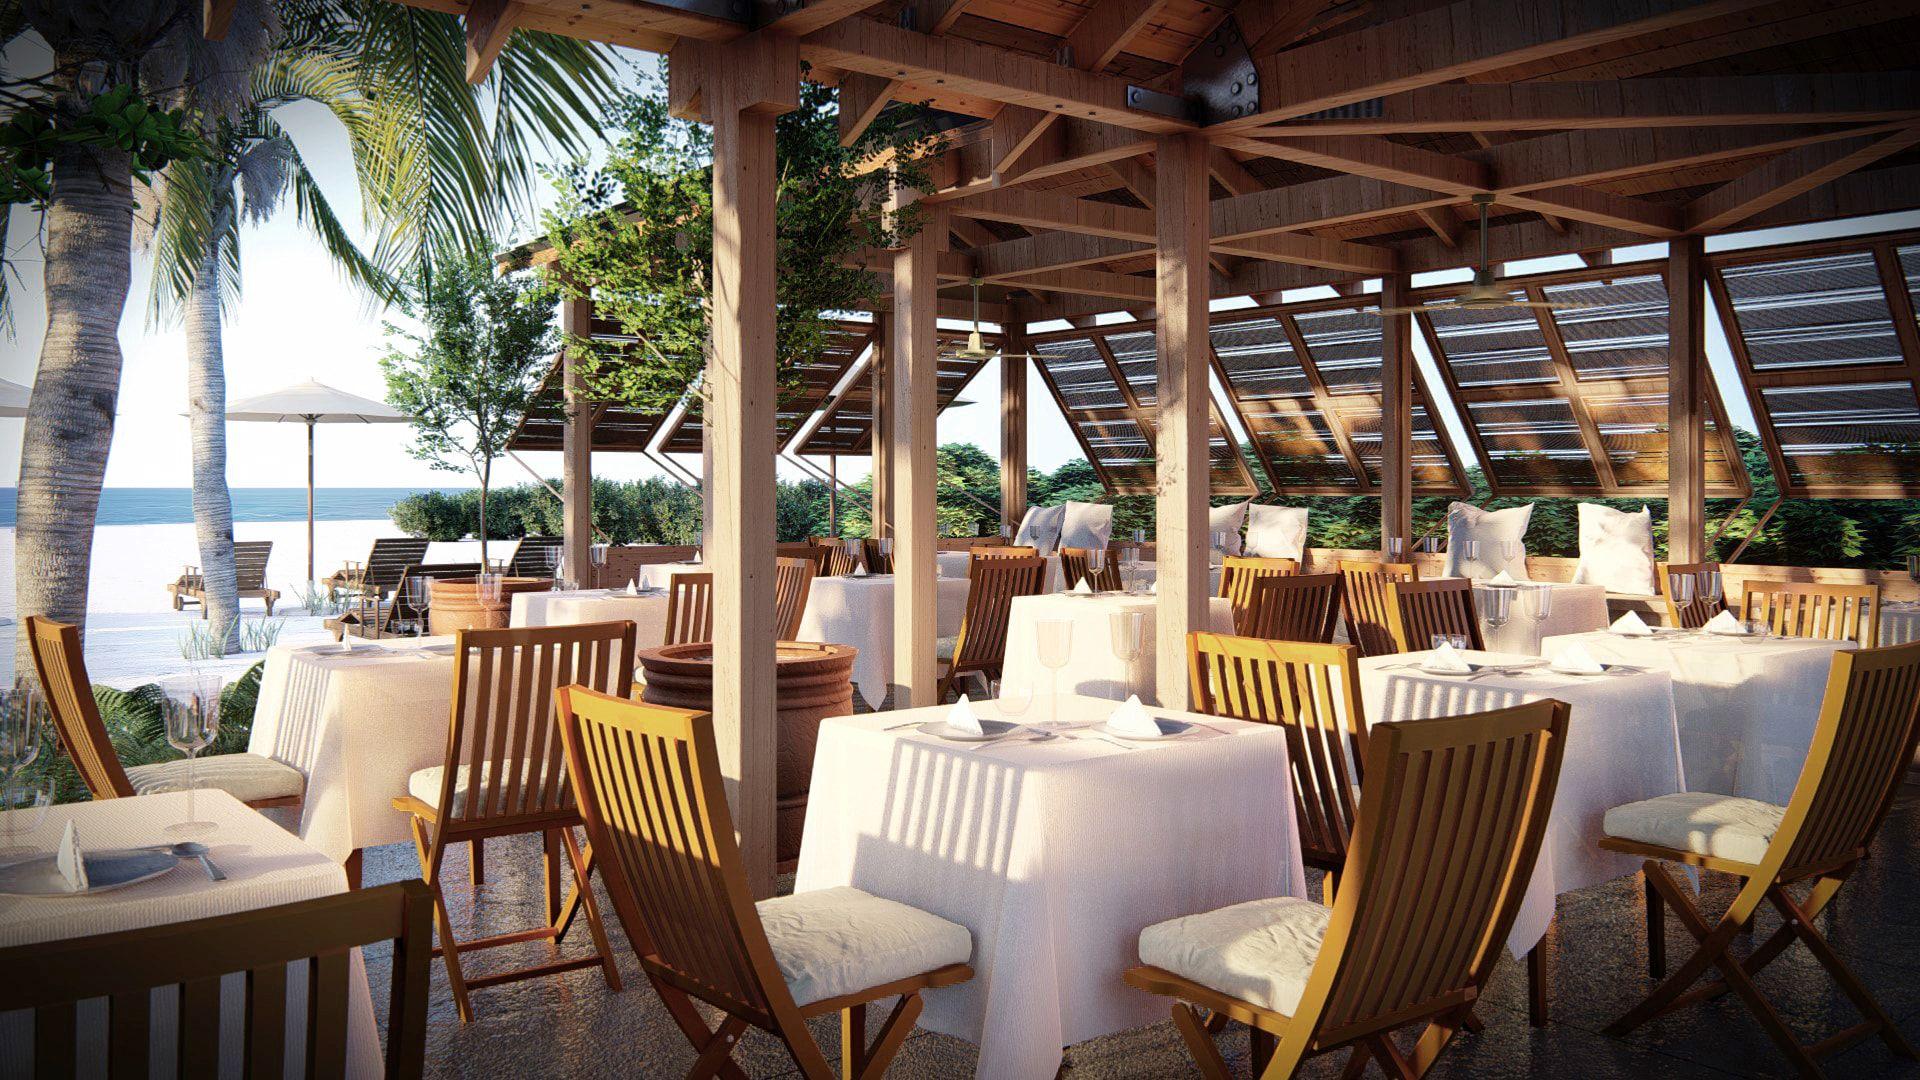 Restaurant outdoor veranda, rendered in Lumion 8 by